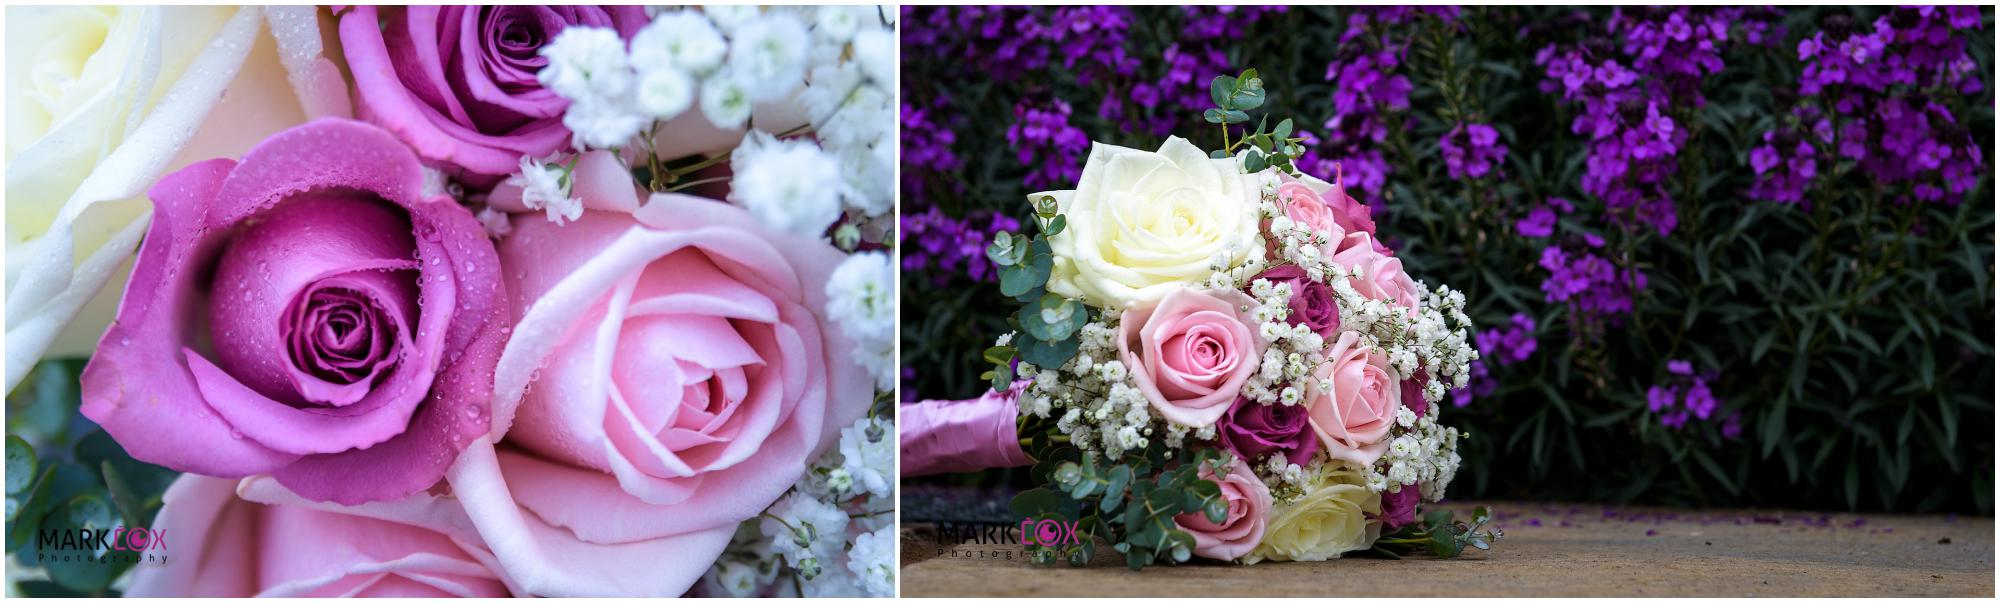 Pink Roses Wedding Flowers - Taunton Wedding Photographer -001